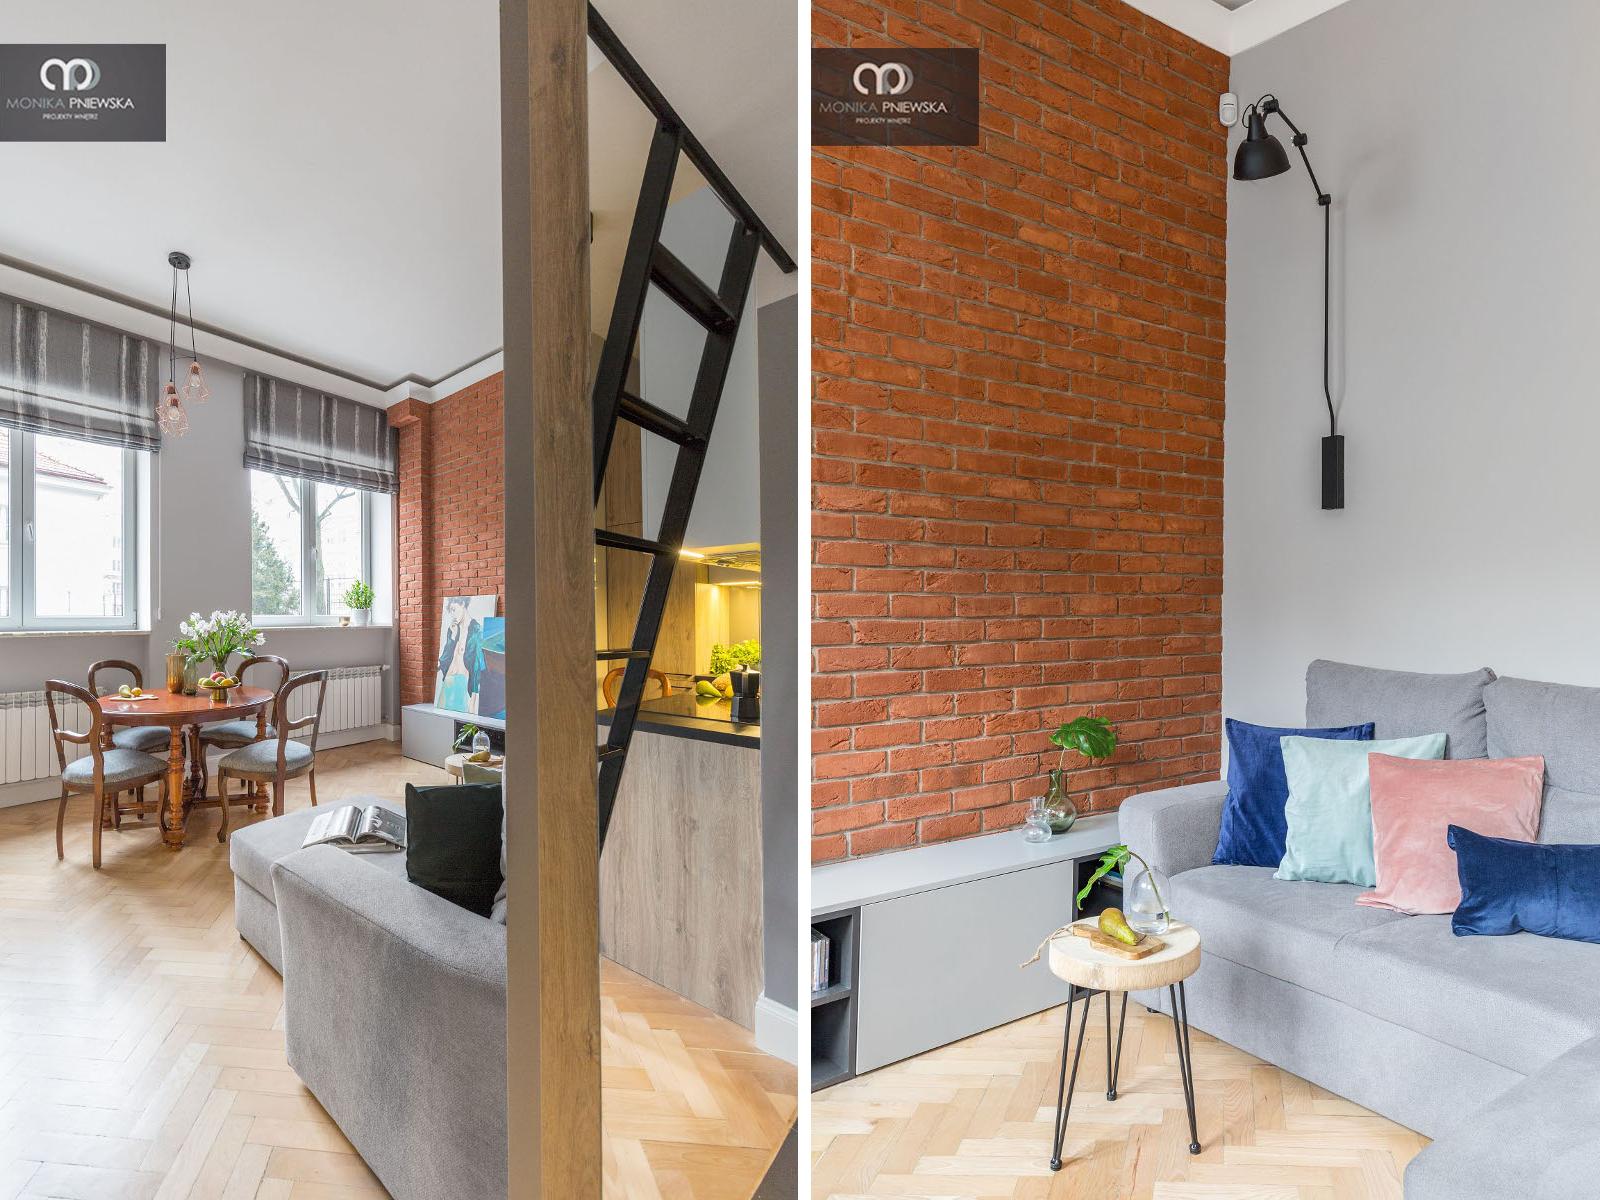 Metamorfoza mieszkania | proj. Monika Pniewska